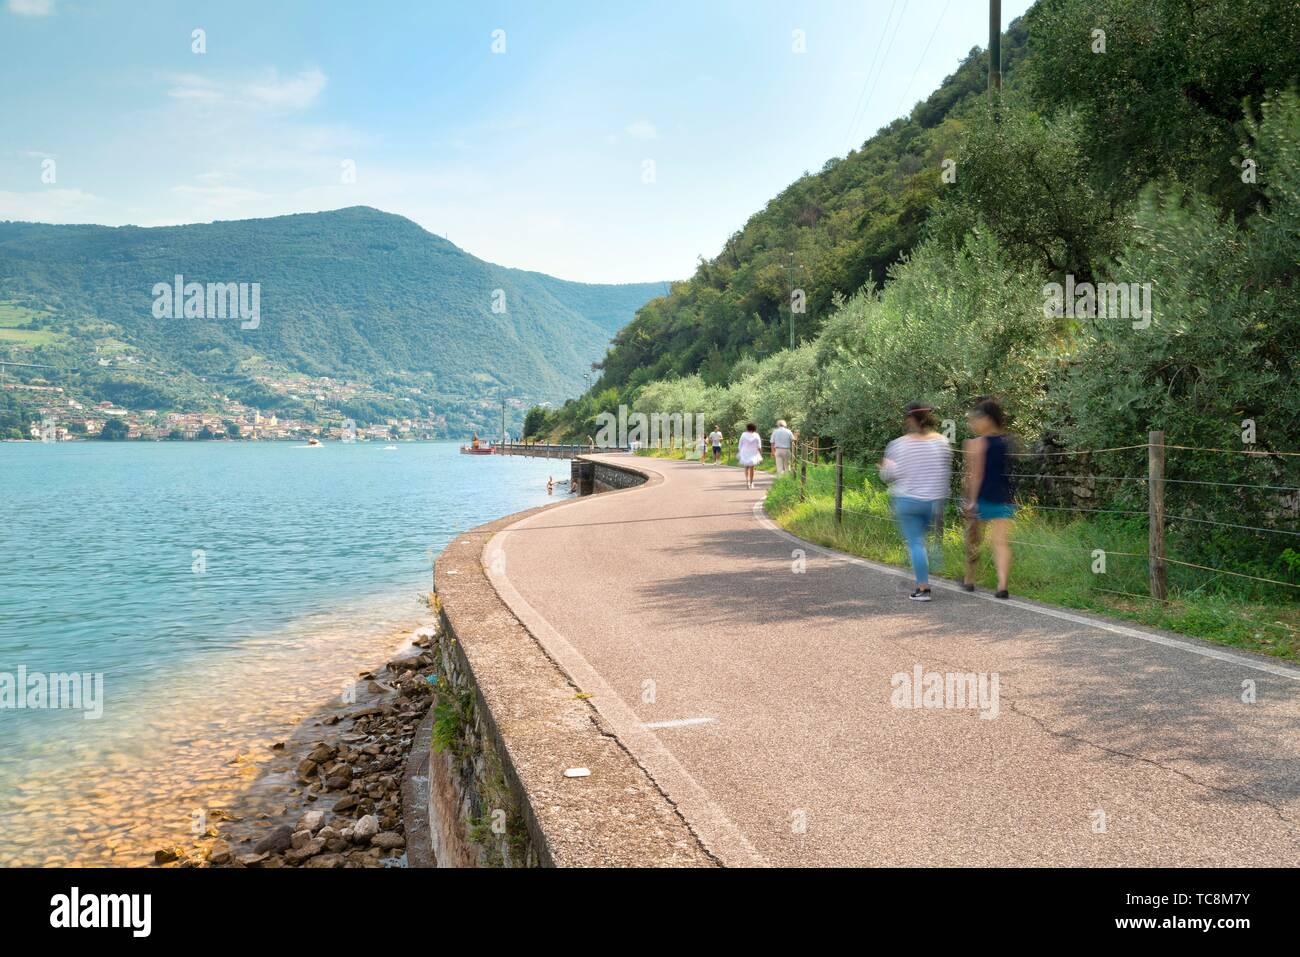 Monte Isola, Lombardy, Italy Stock Photo